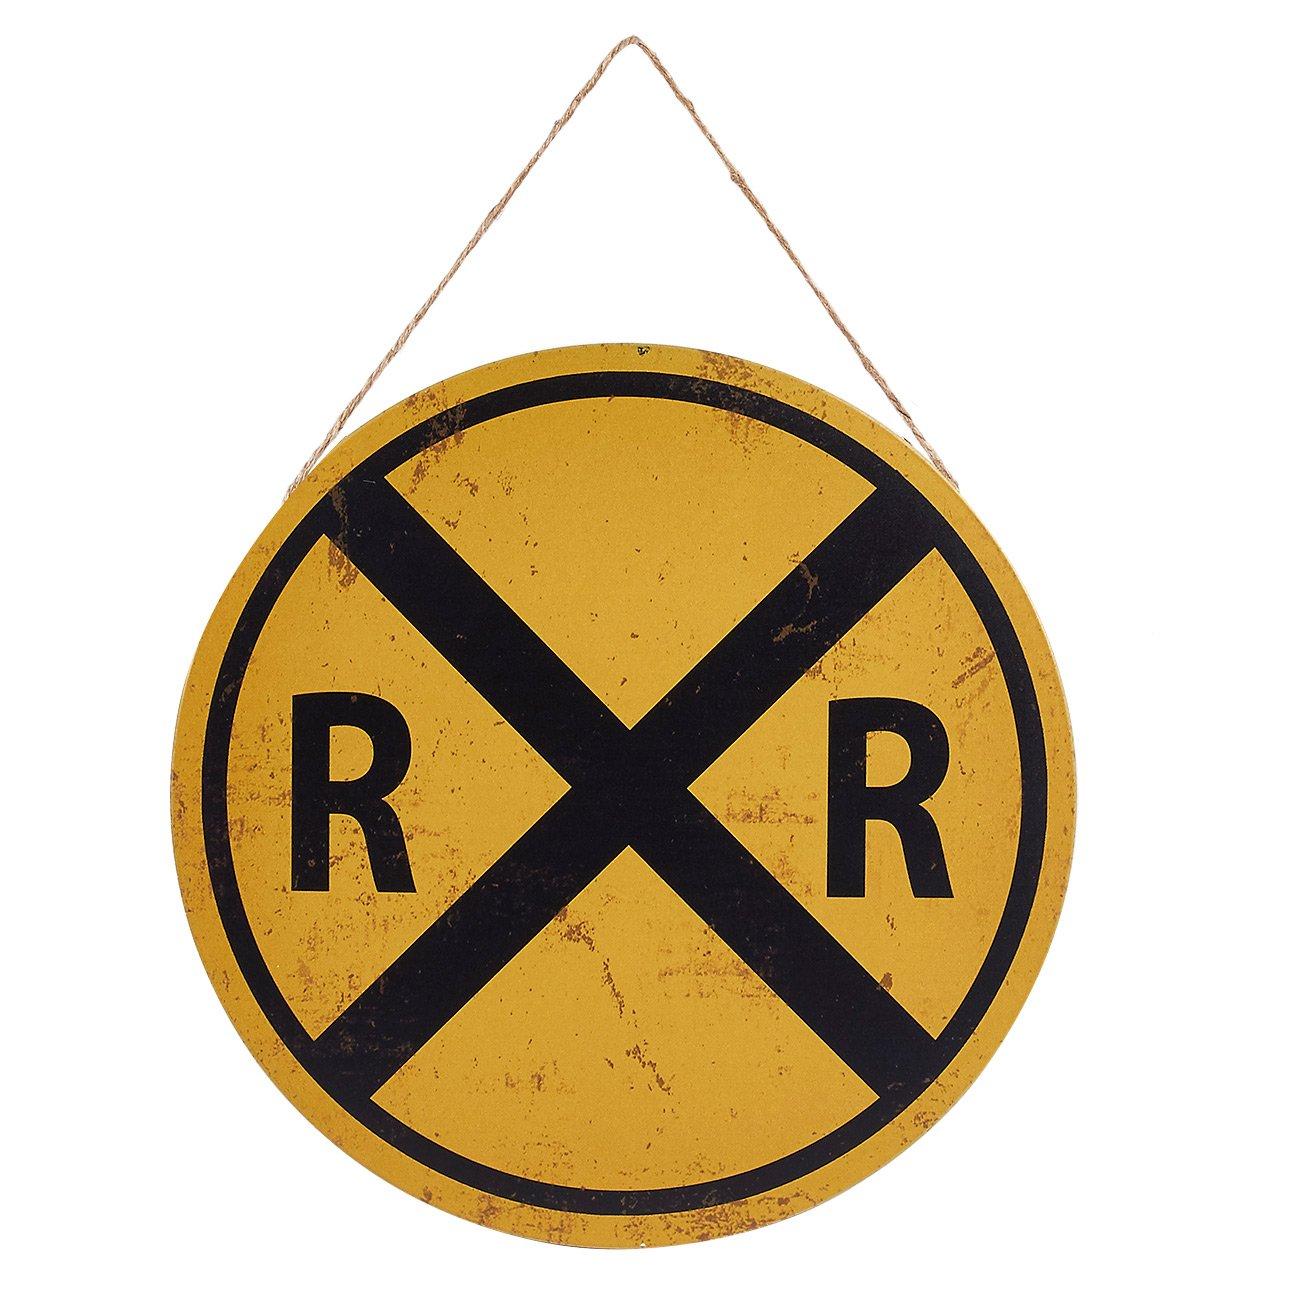 Rocky Railway VBS Decor Ideas #VBS #RockyRailway